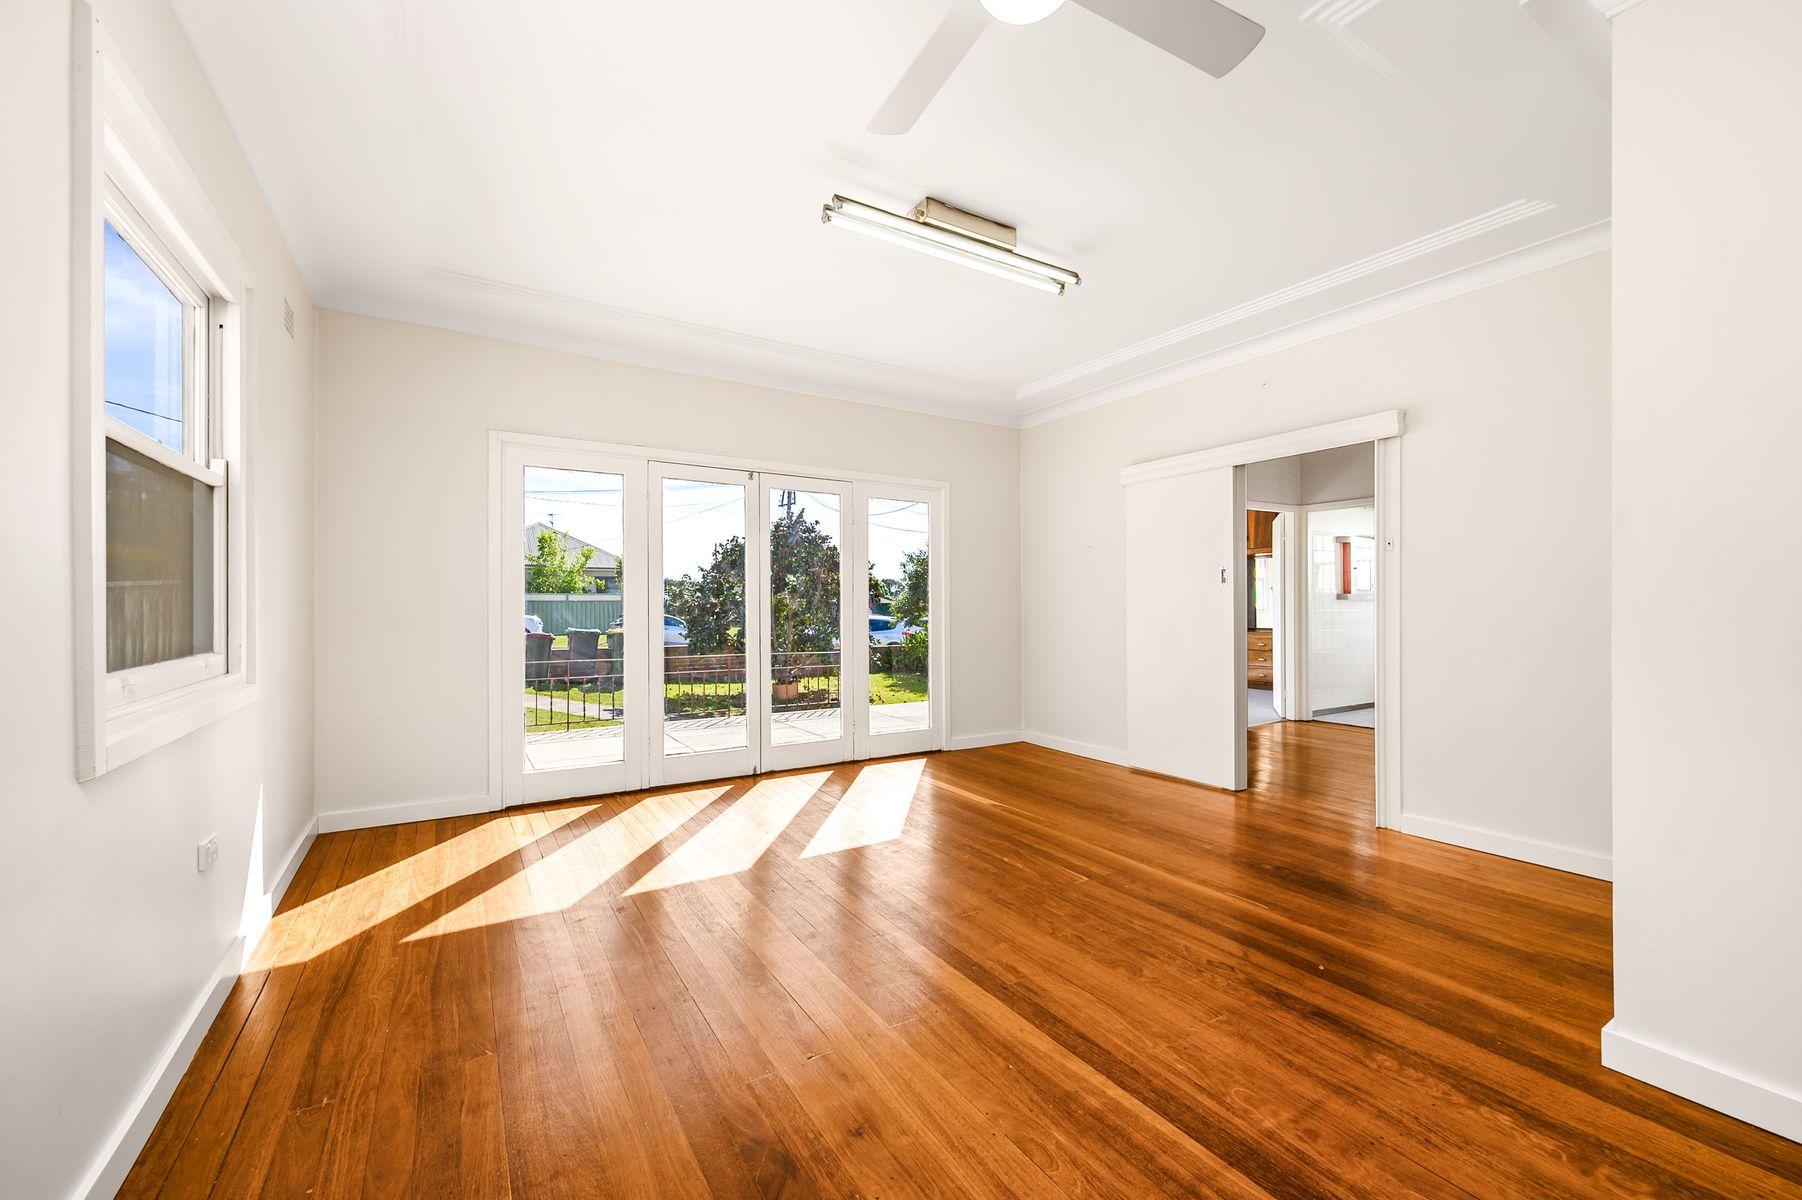 17 Crest Road, Wallsend, NSW 2287